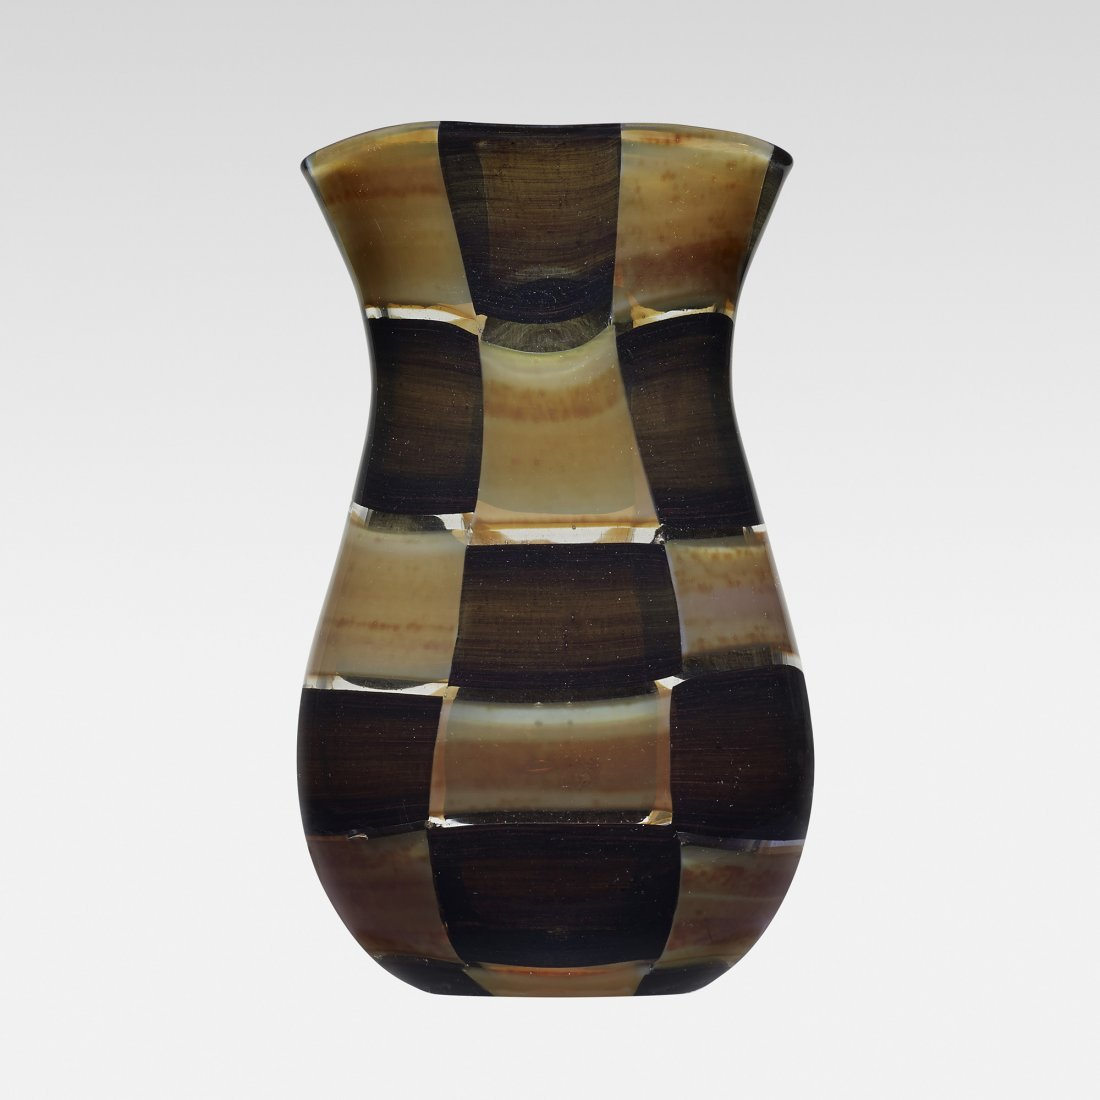 Ercole Barovier Moresco vase